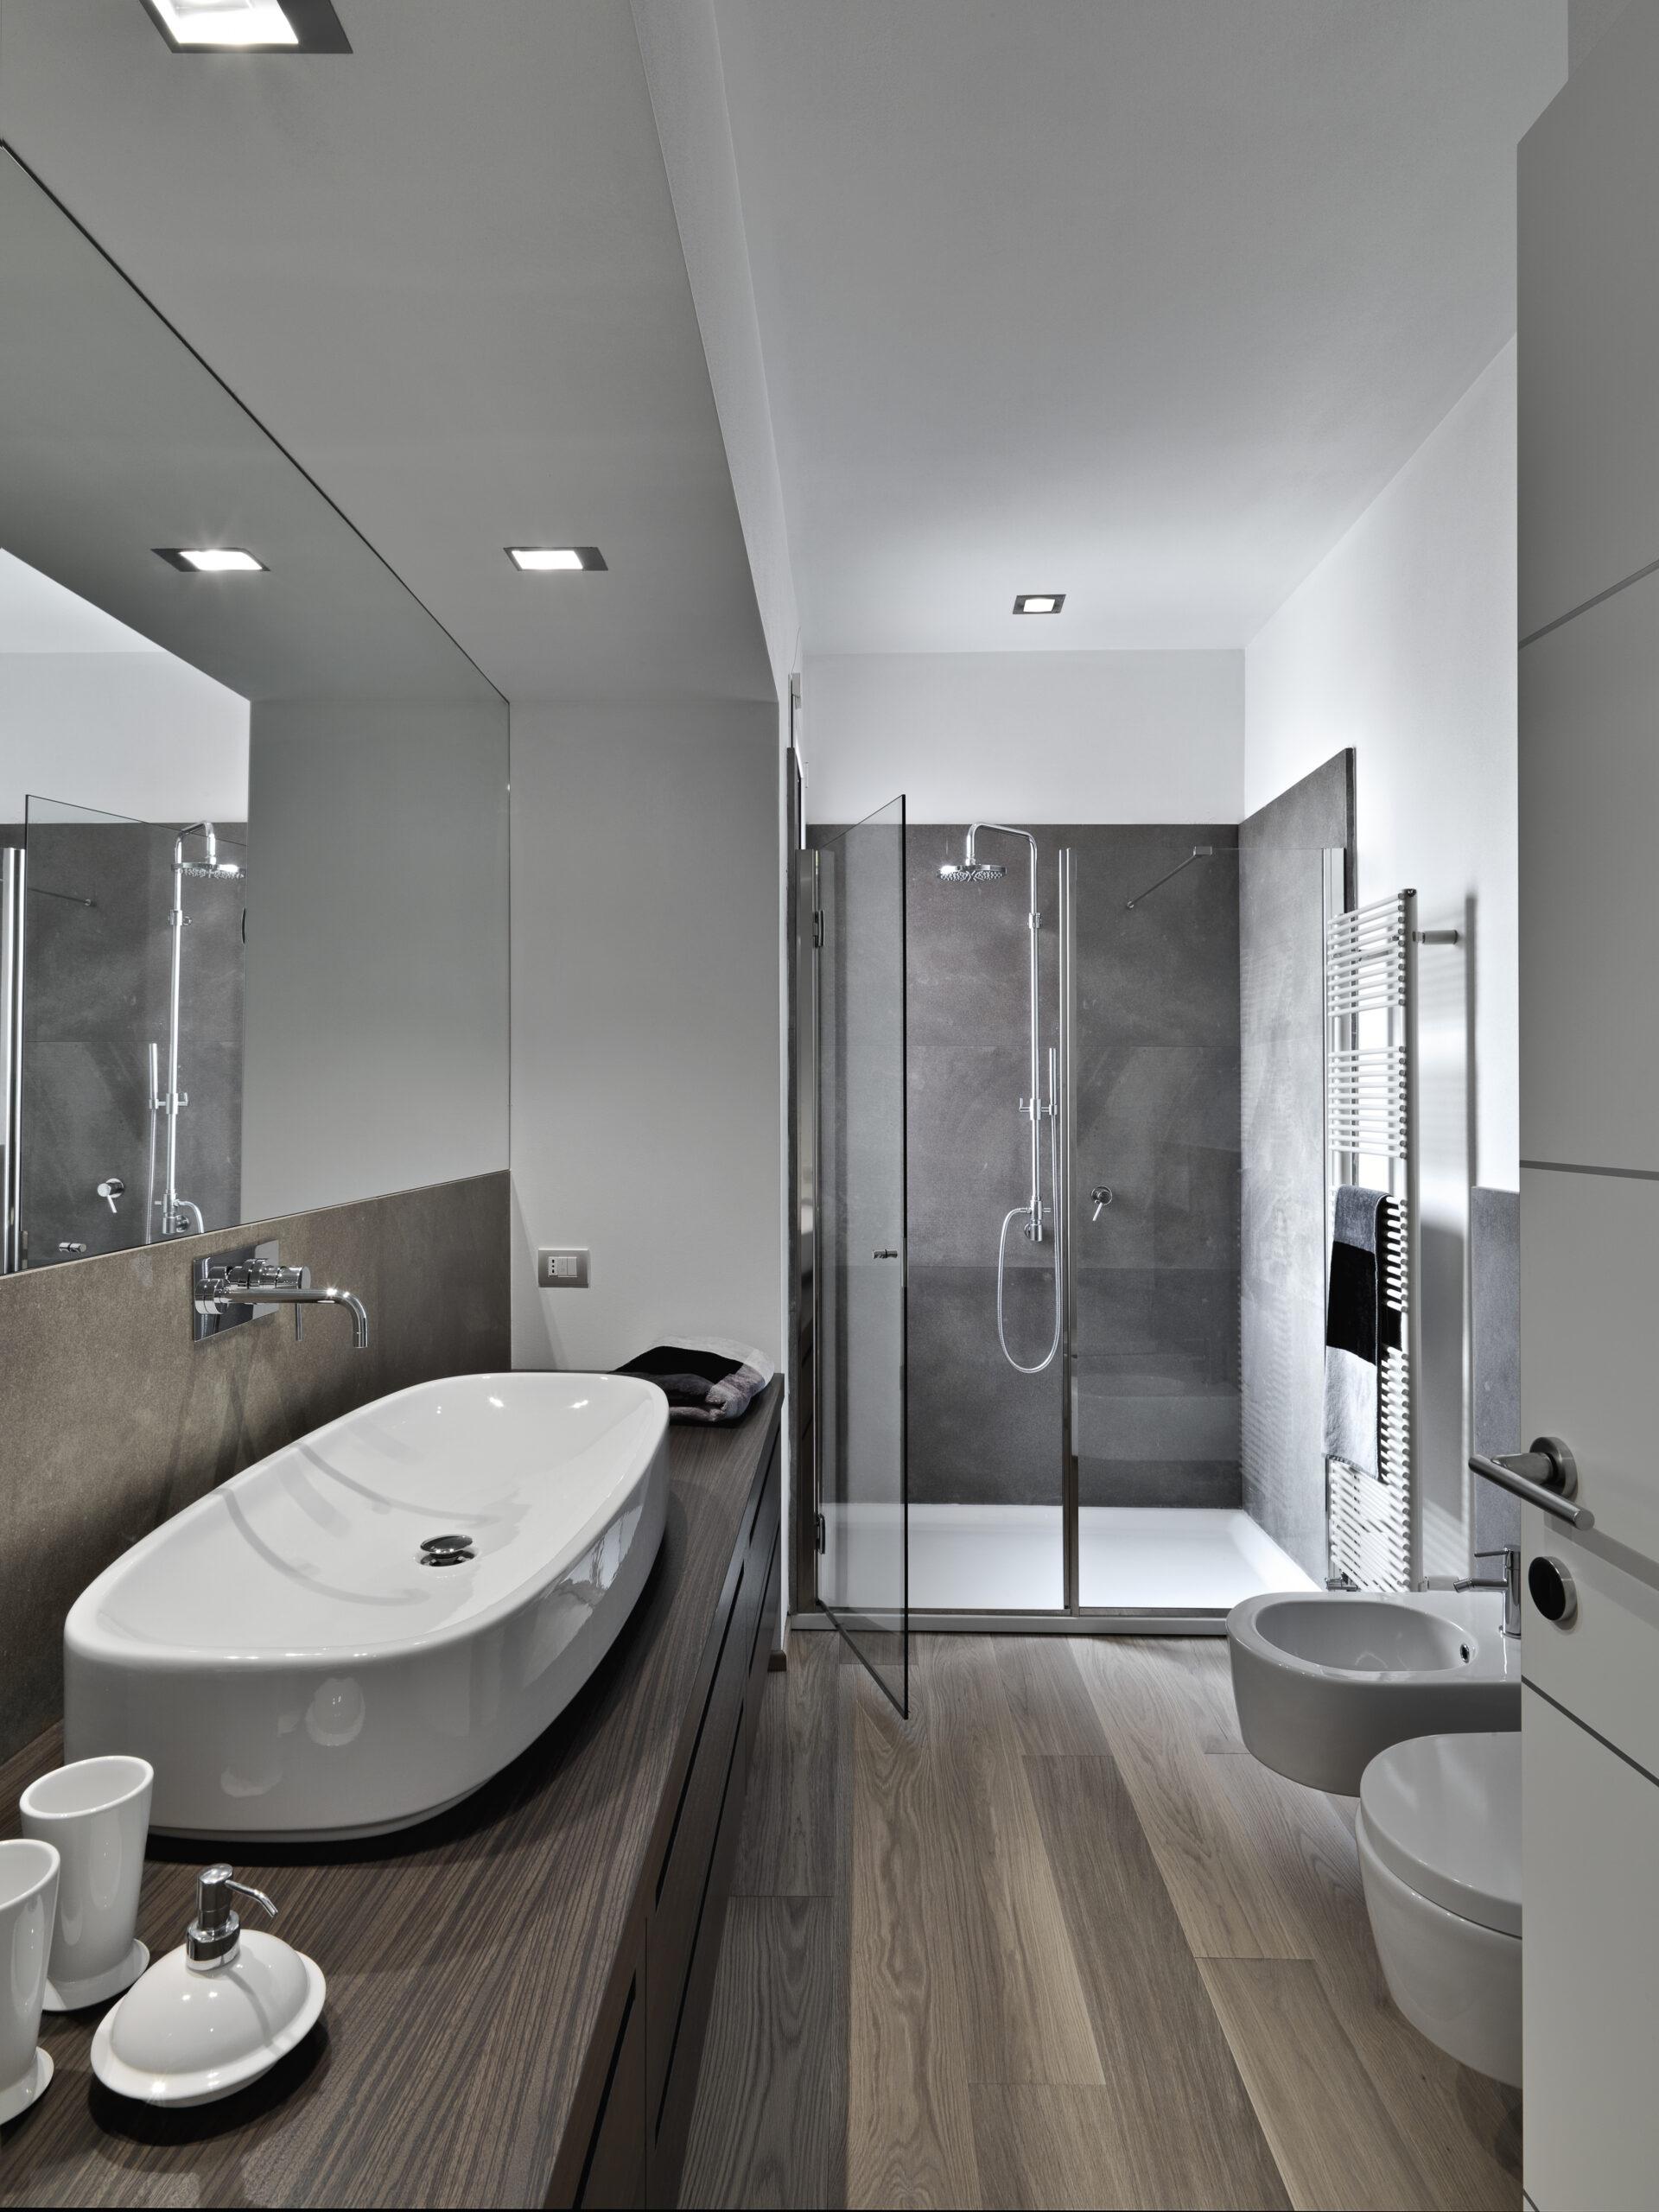 bathroom with lvp flooring